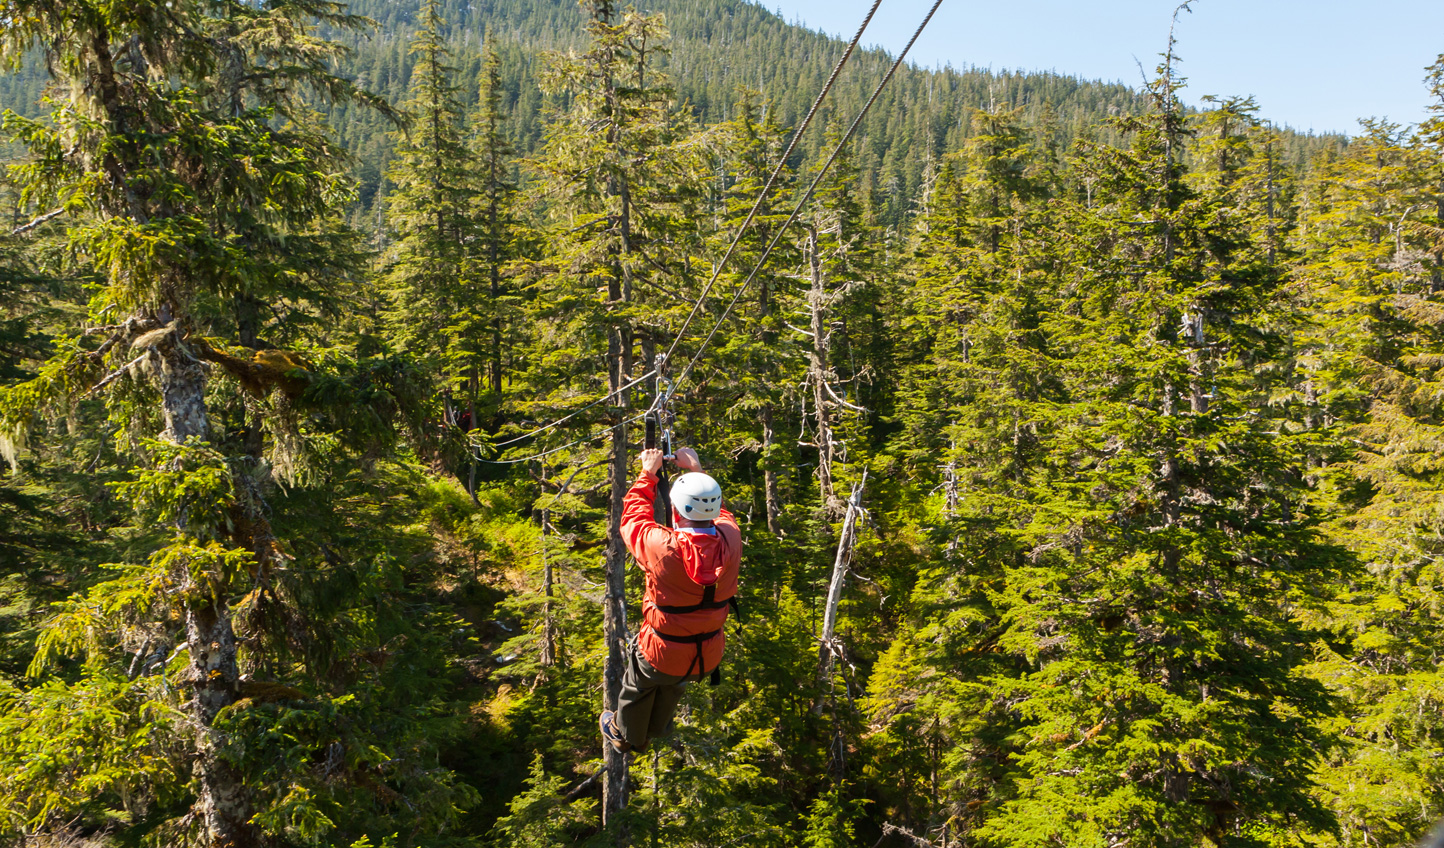 Soar through the treeline on a zip-trekking adventure